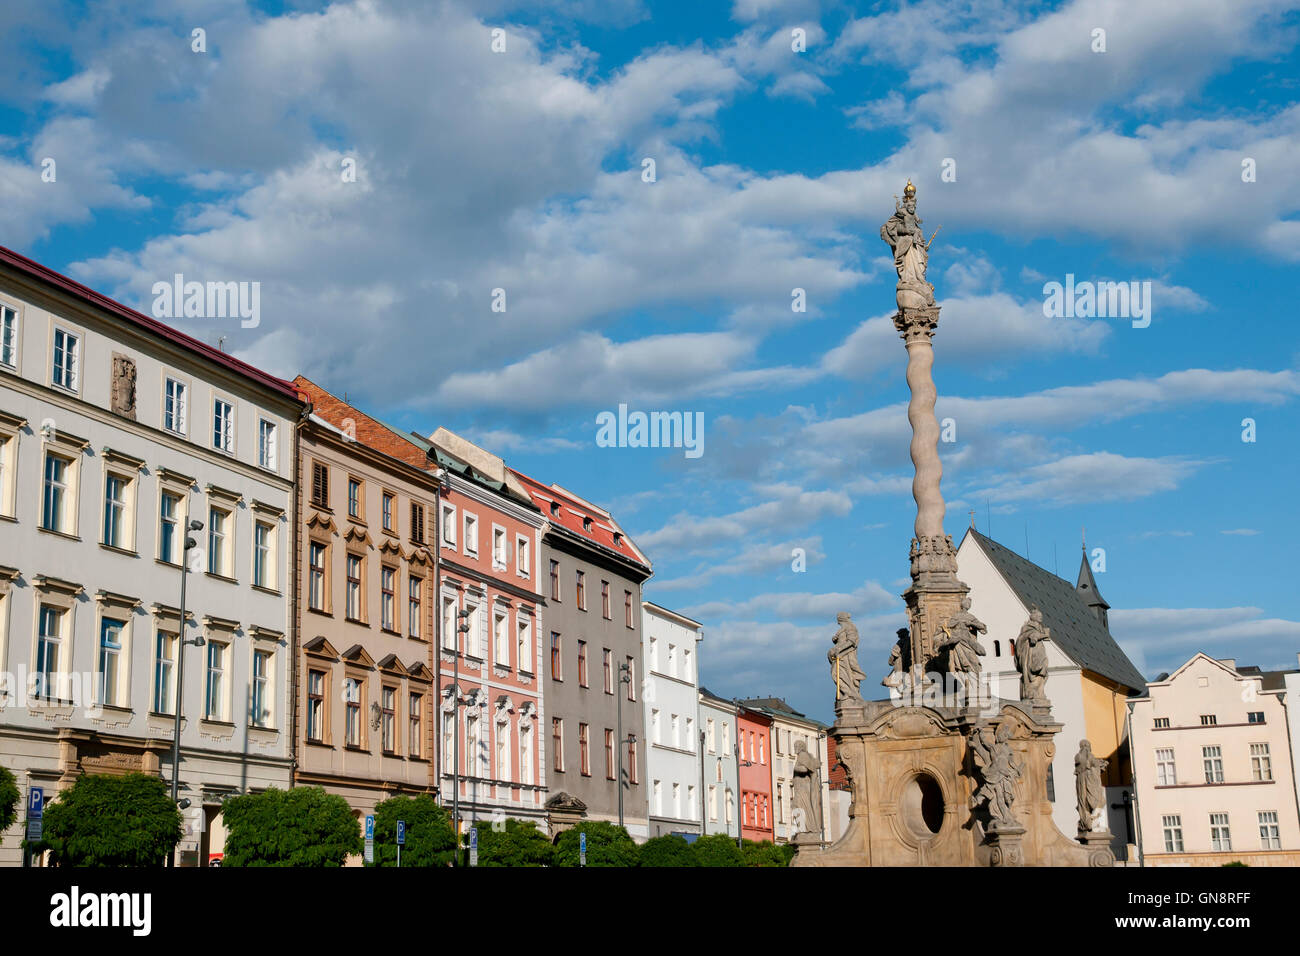 Marian Column - Olomouc - Czech Republic - Stock Image